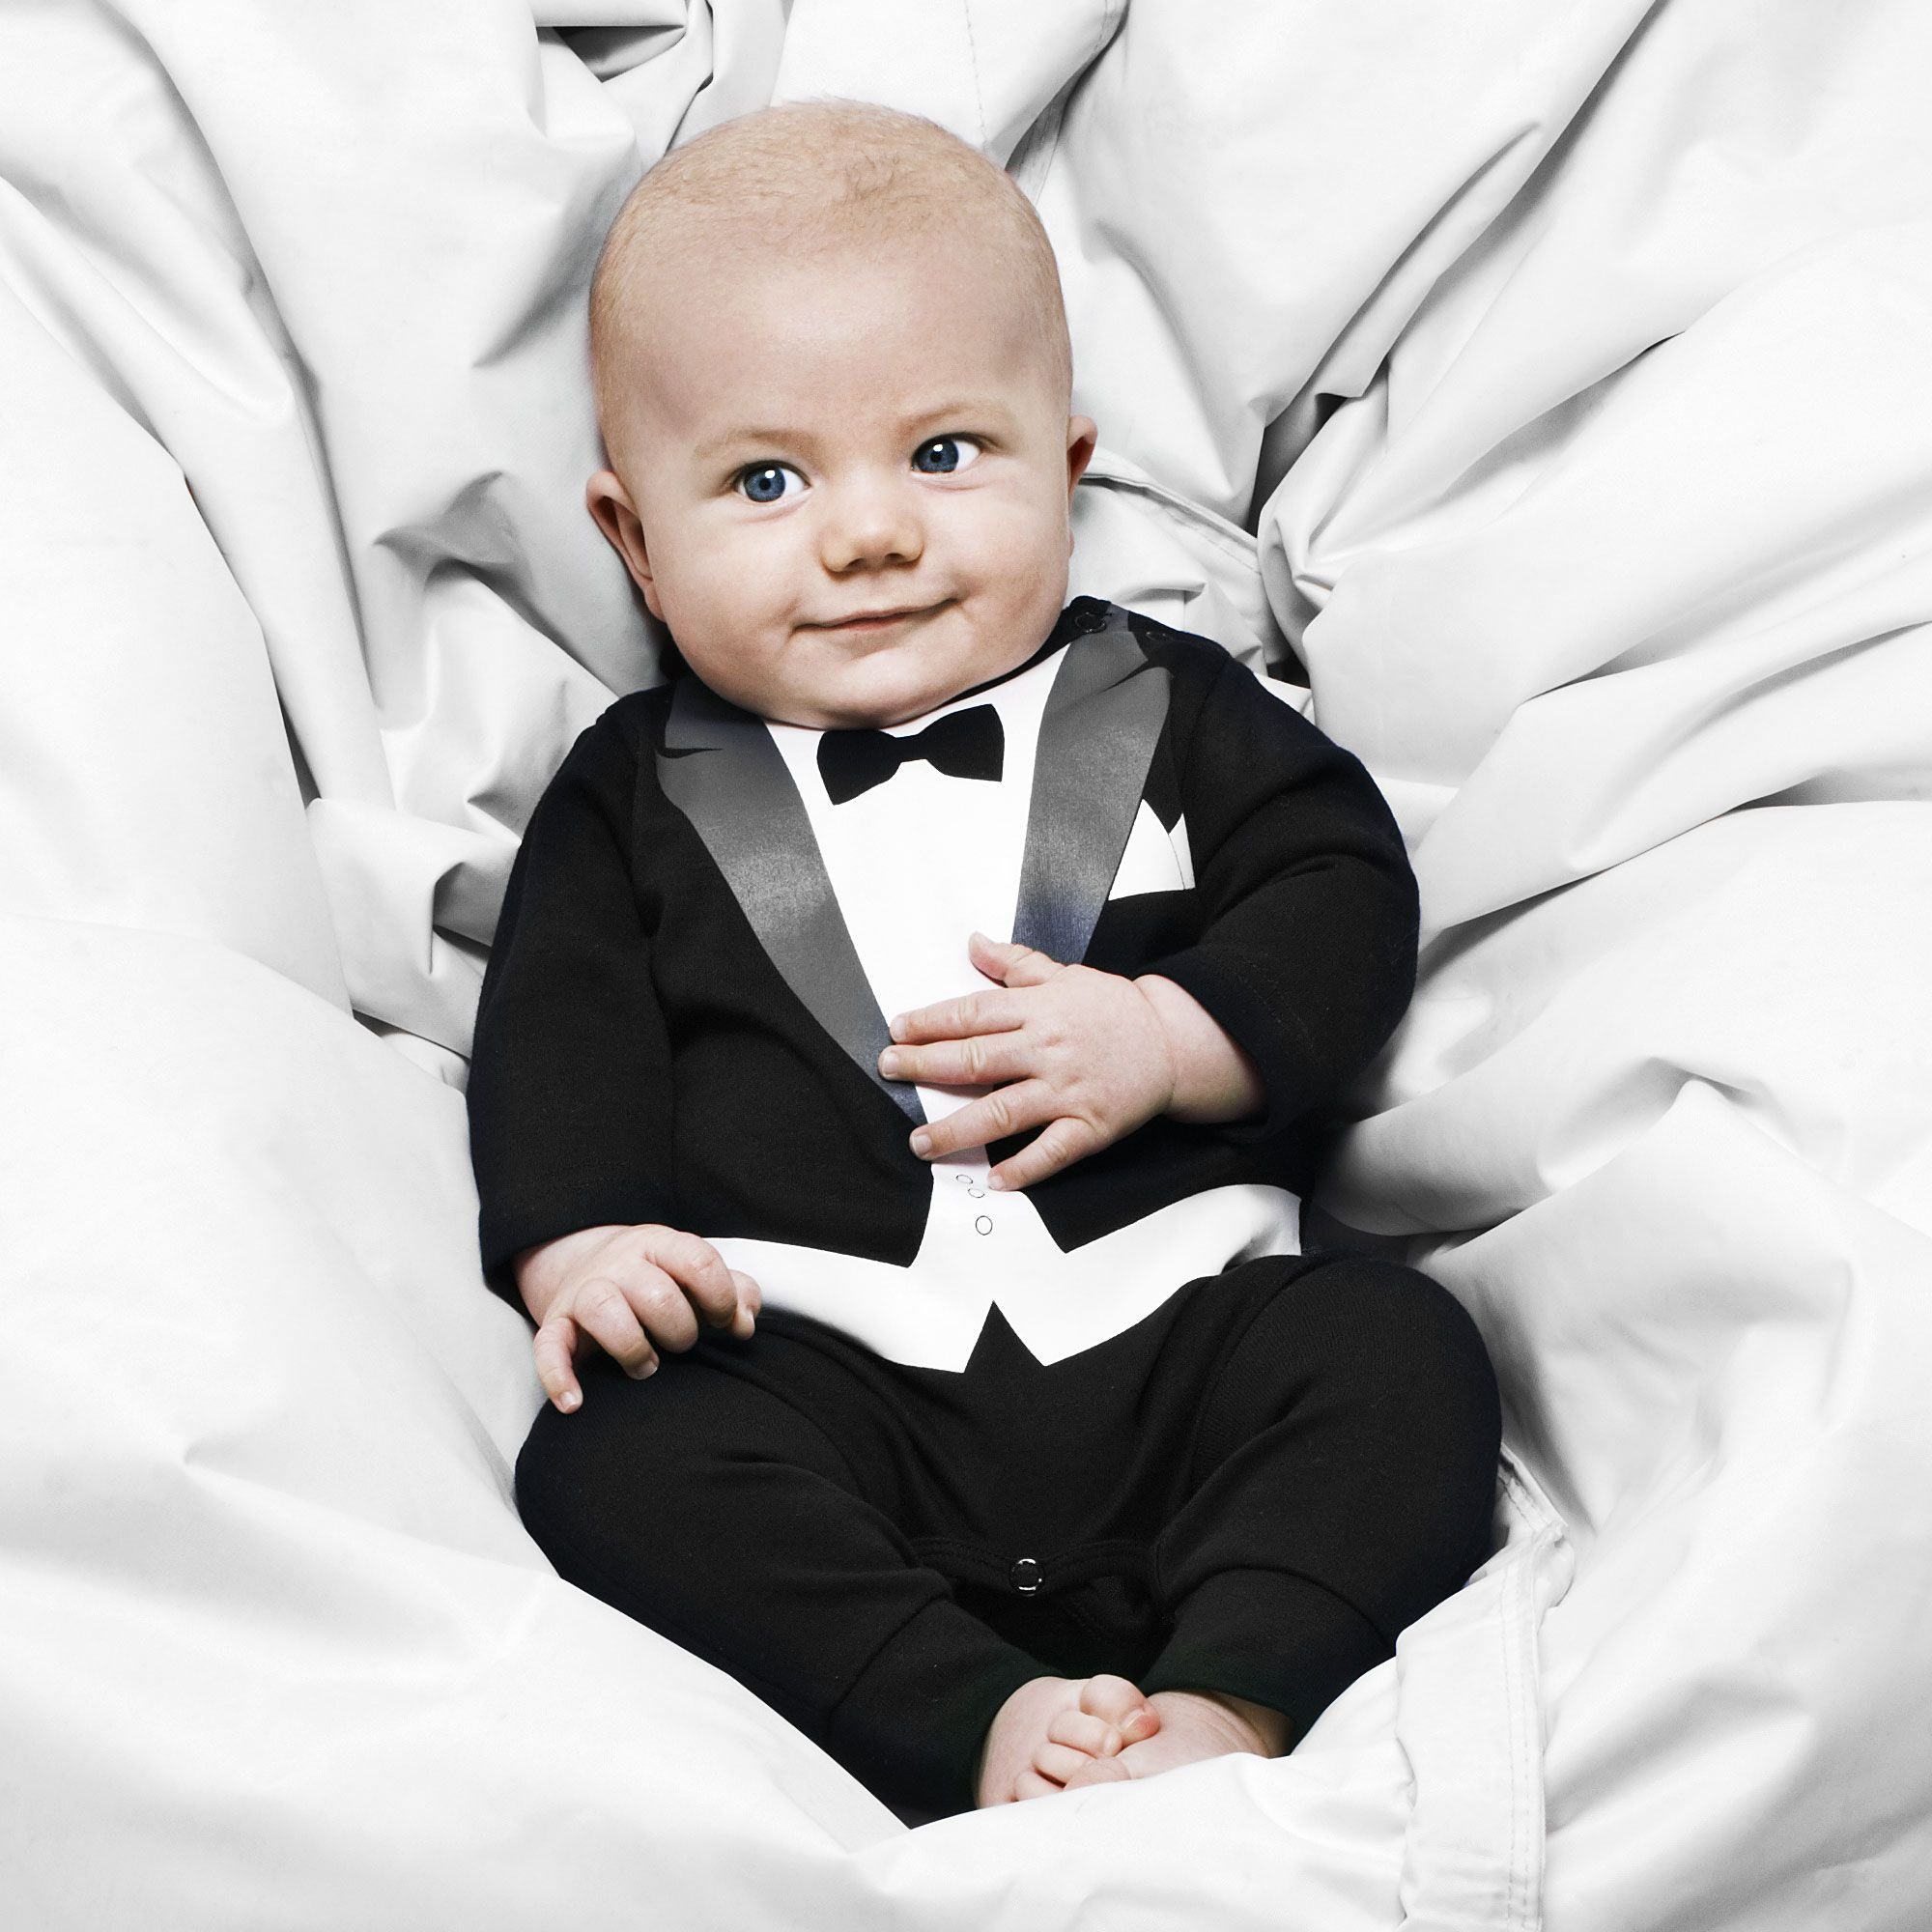 6780b00a0bb The Tiny Universe | Kruippakje suit - Babykleding en kinderkleding ...